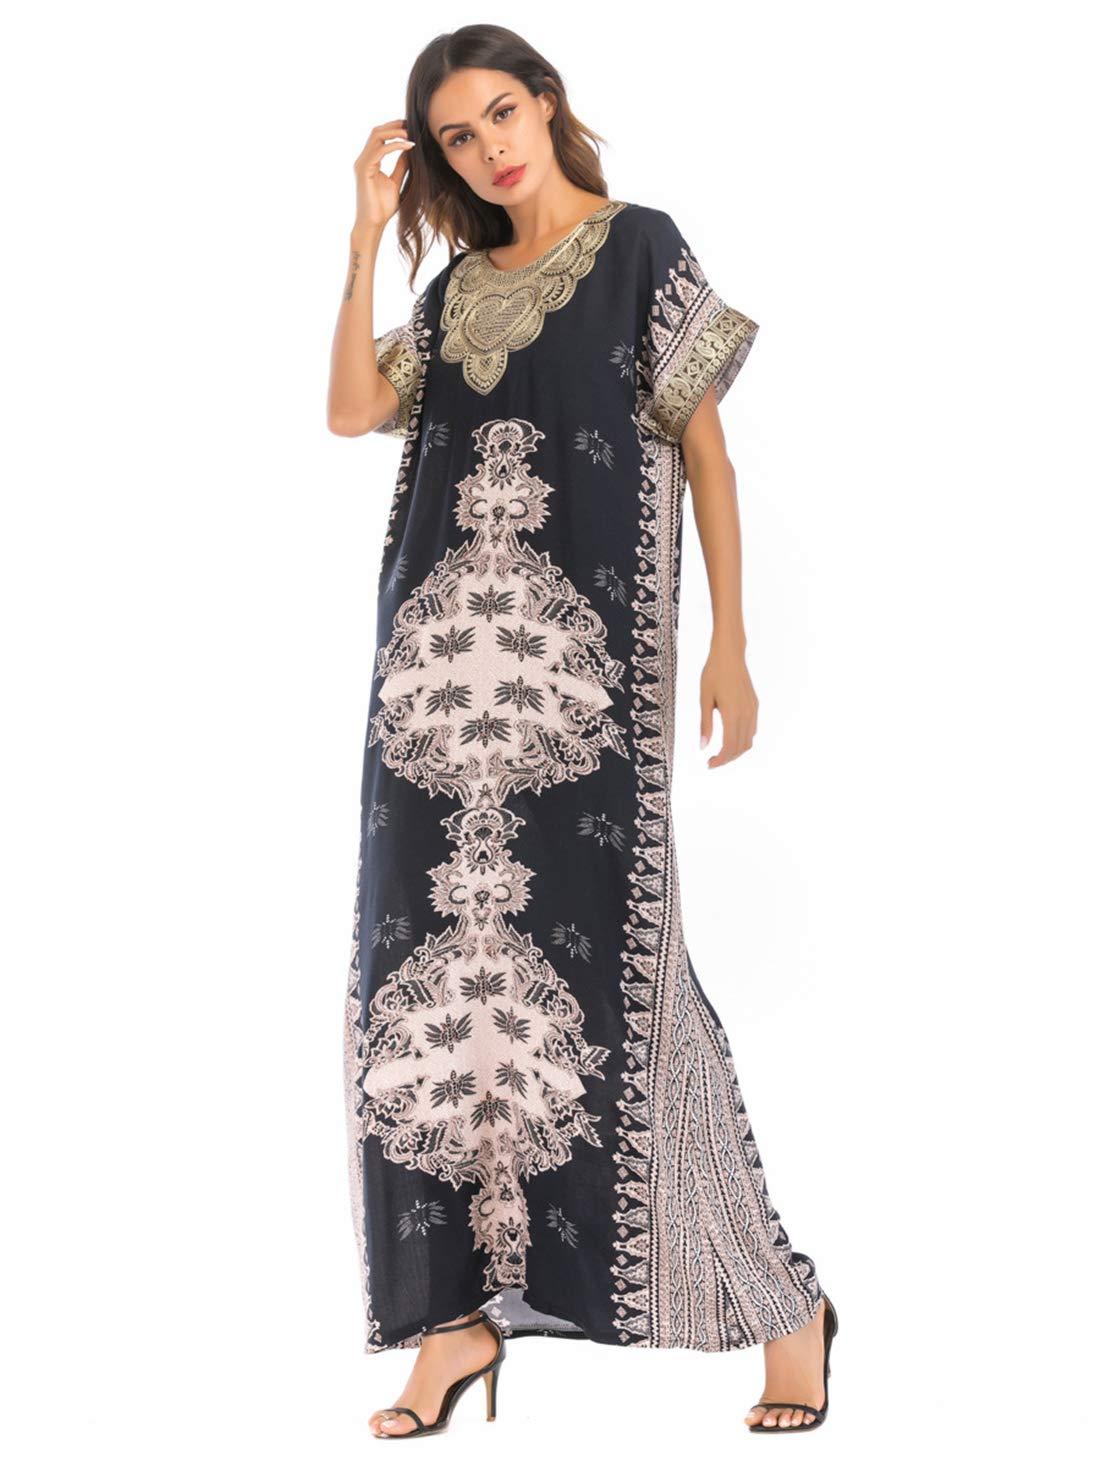 21d76ee755f9f Amazon.com  LIUMM Women s Embroidery Printing Dresses